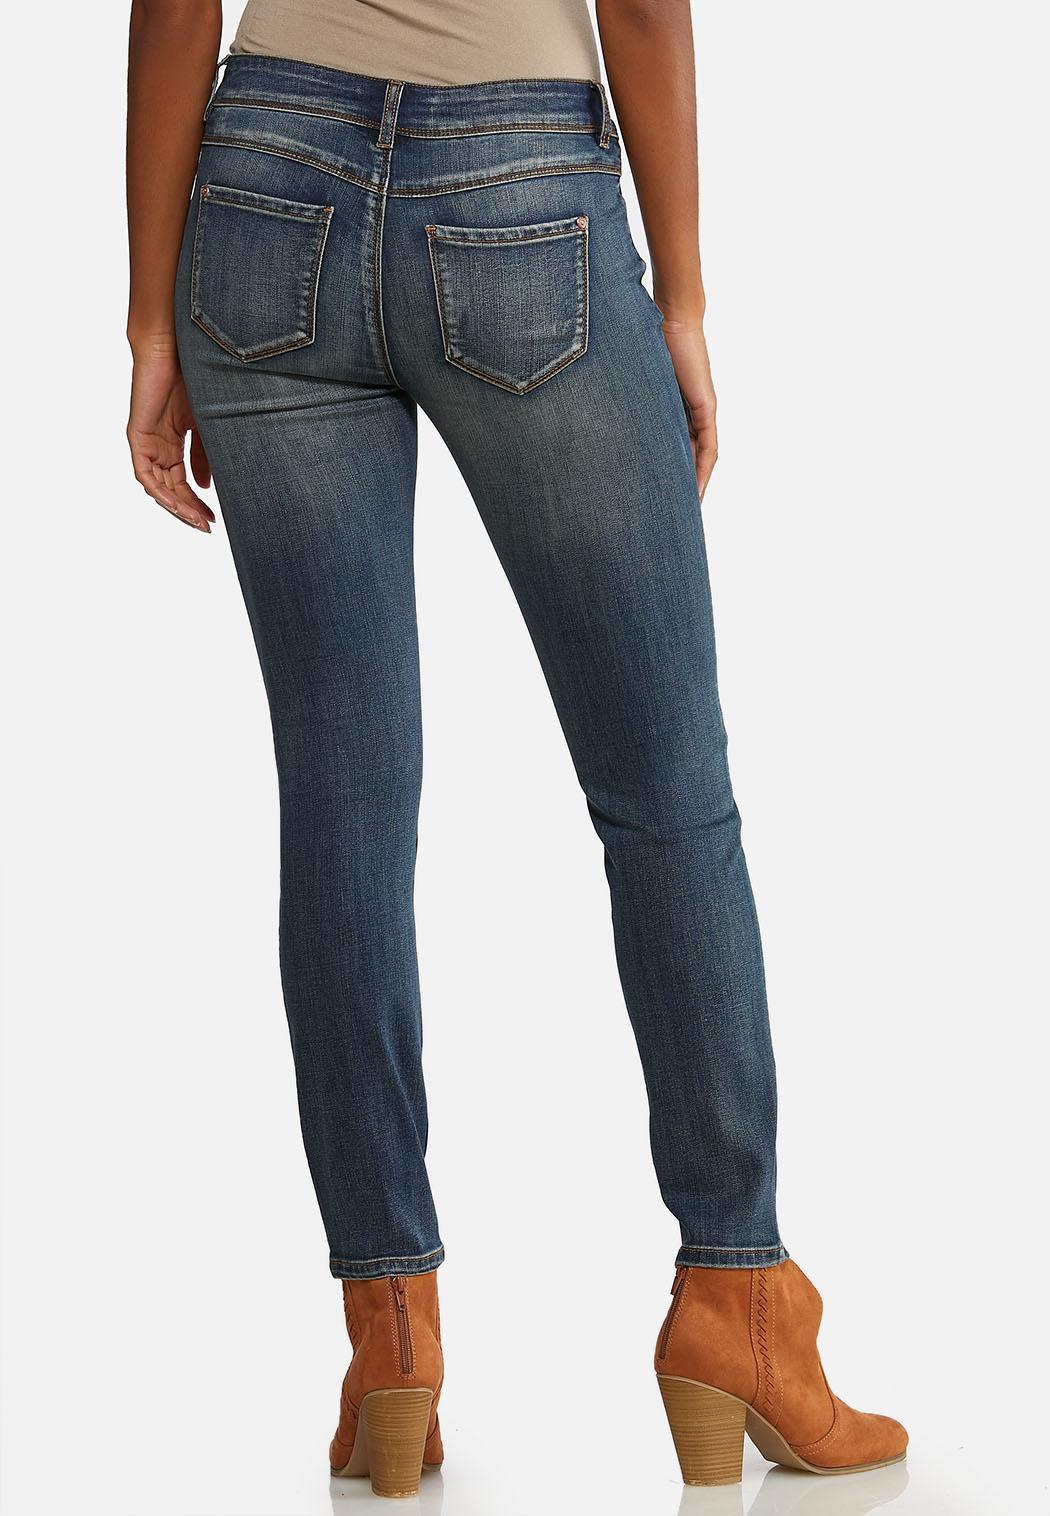 Slimming Skinny Jeans (Item #43991666)